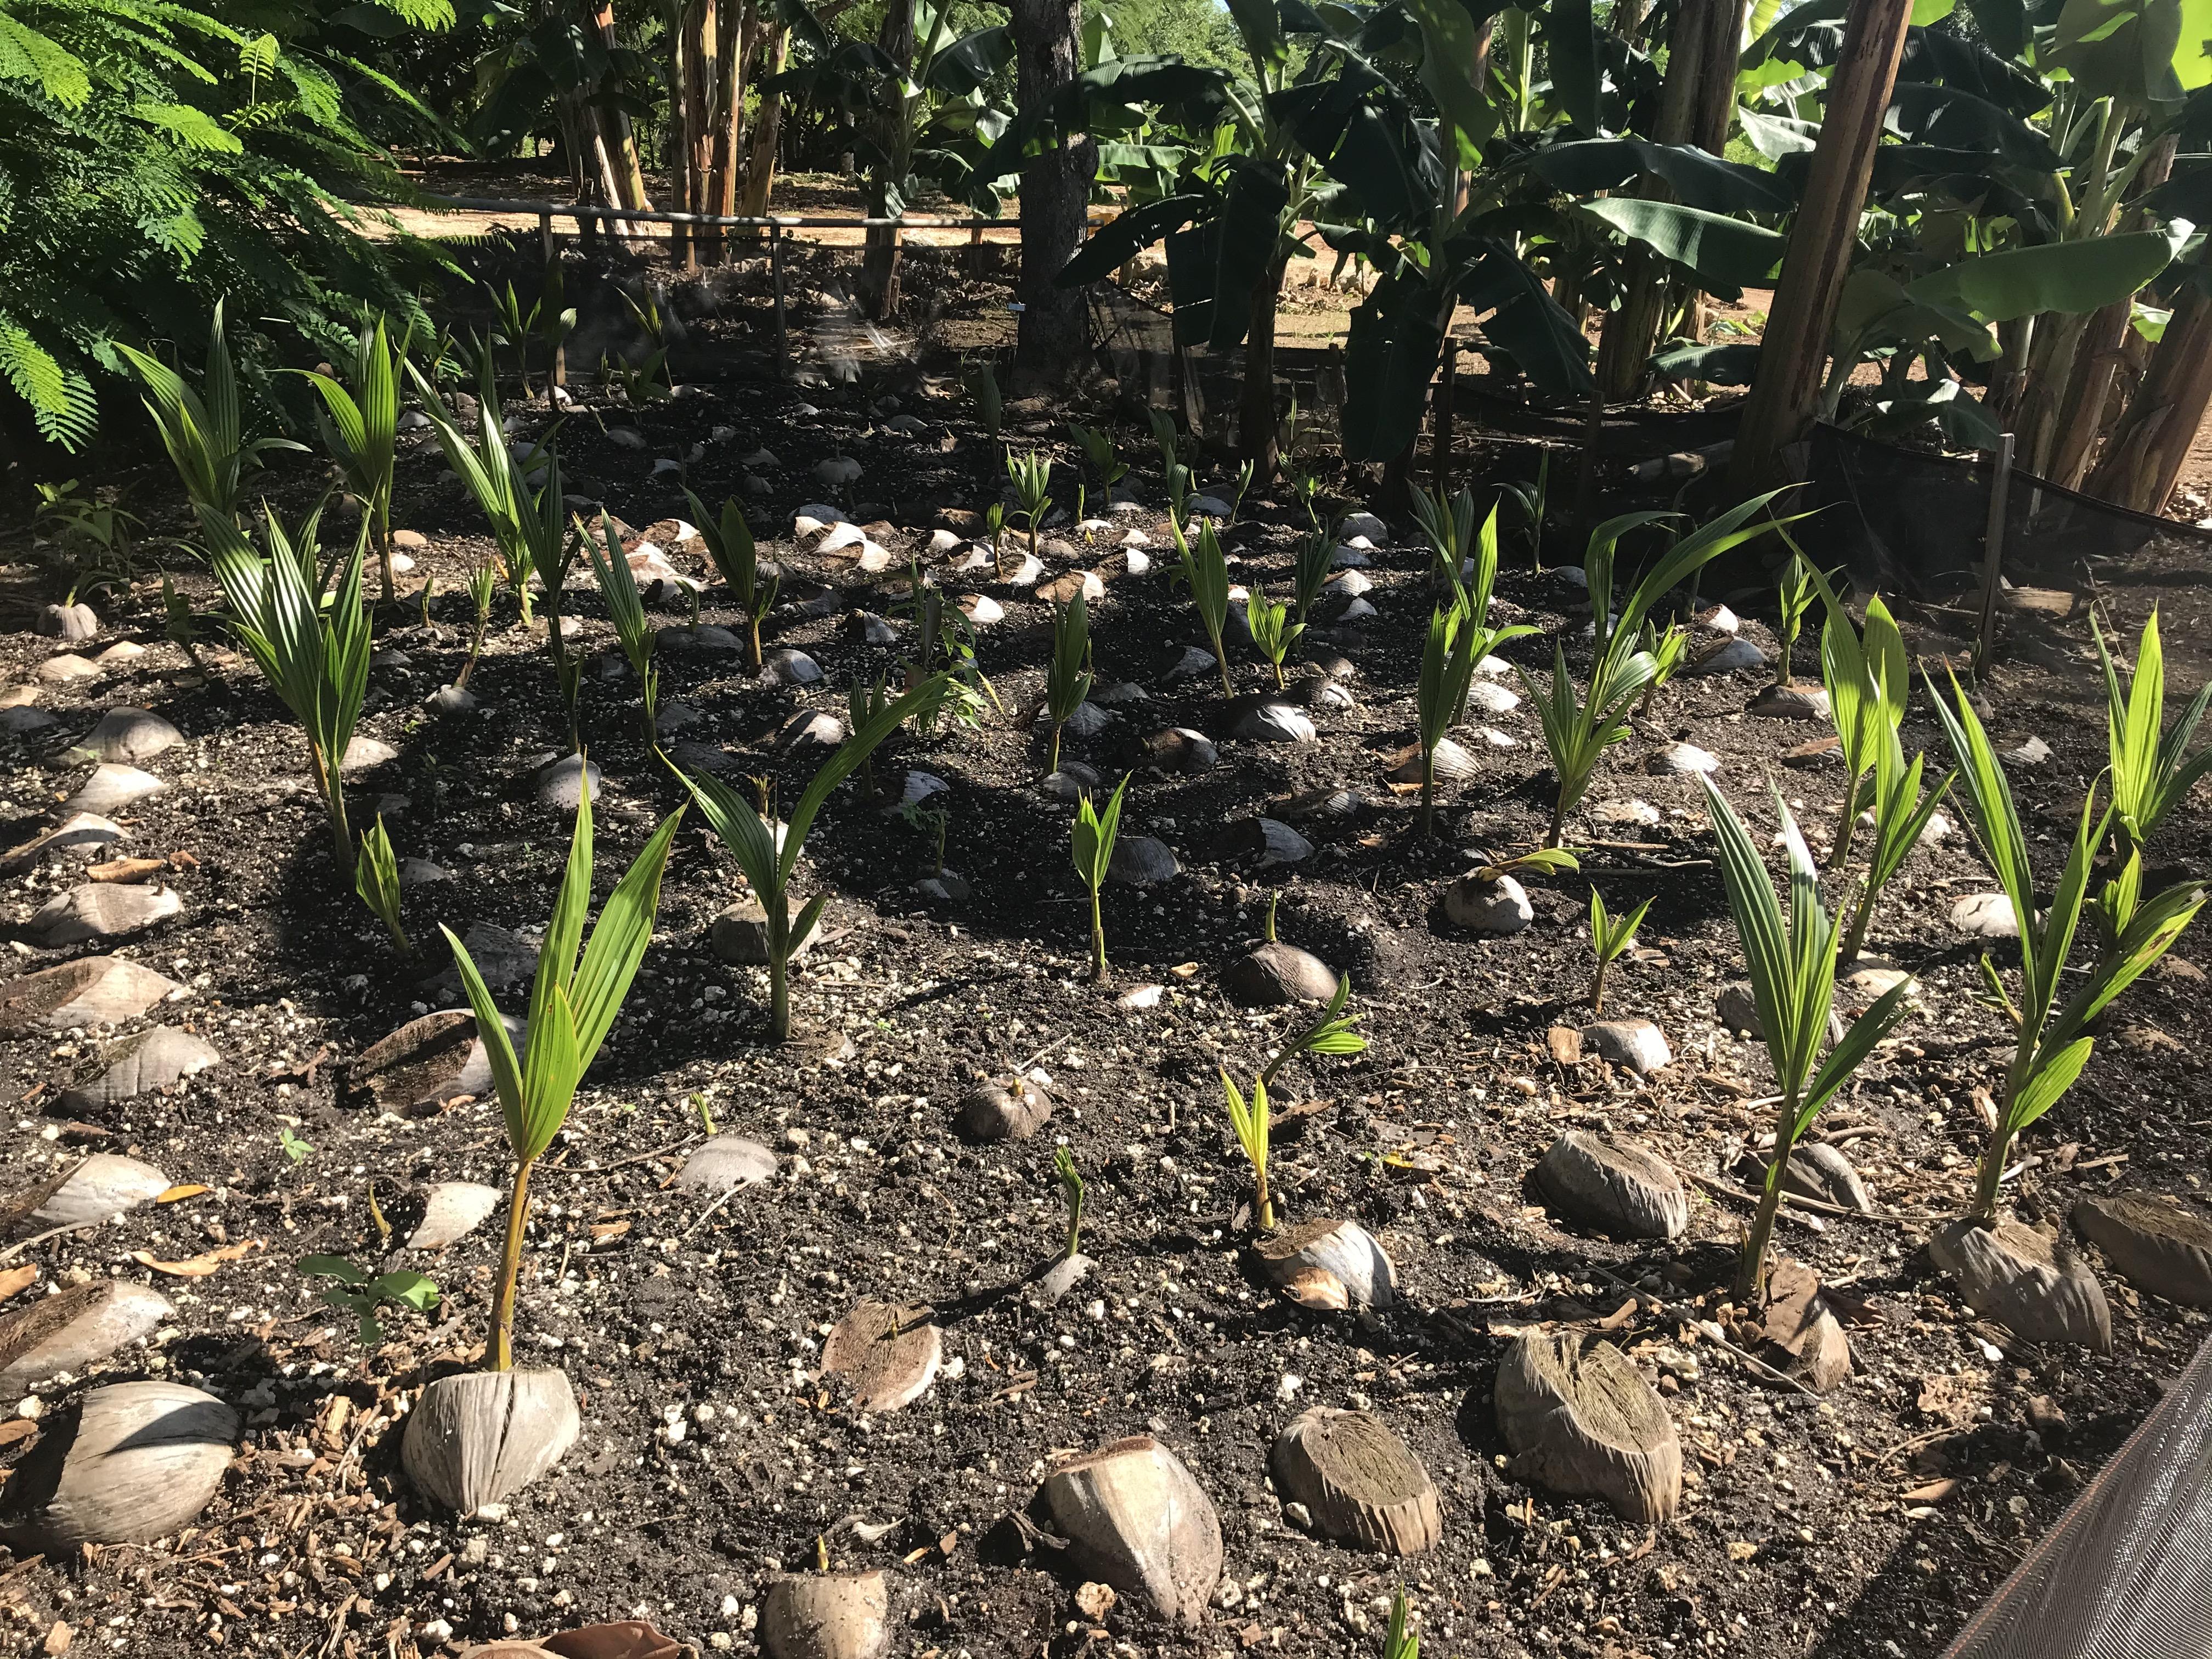 2020.12.01 - Coconut nursery 2